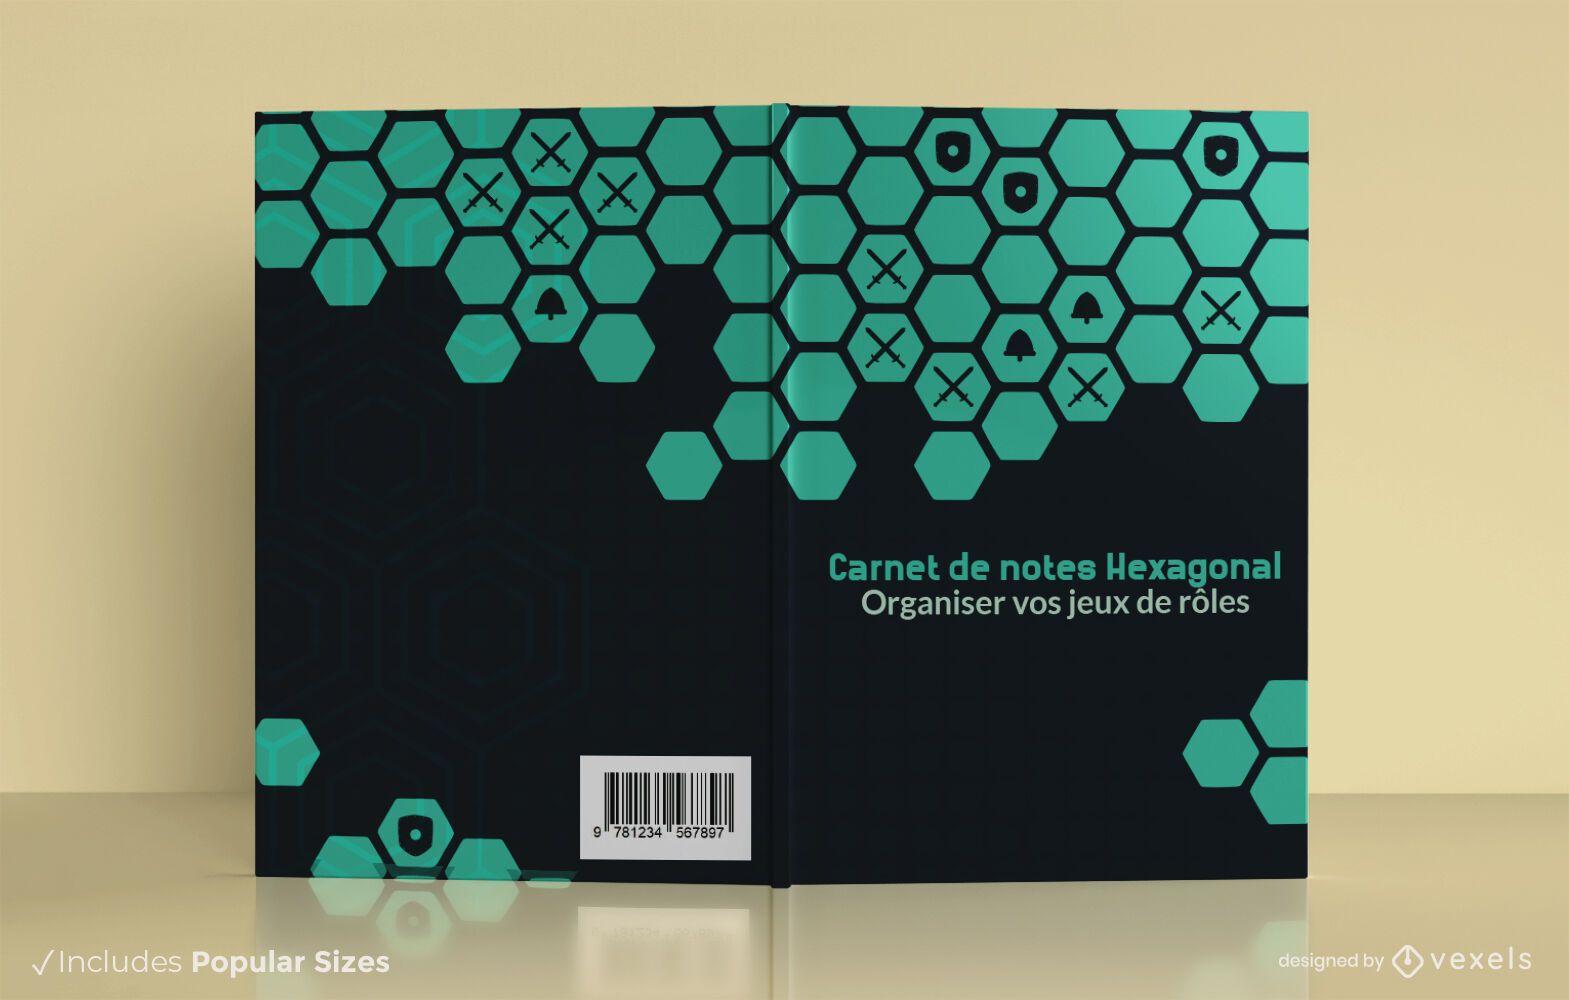 Hexagonal notebook cover design